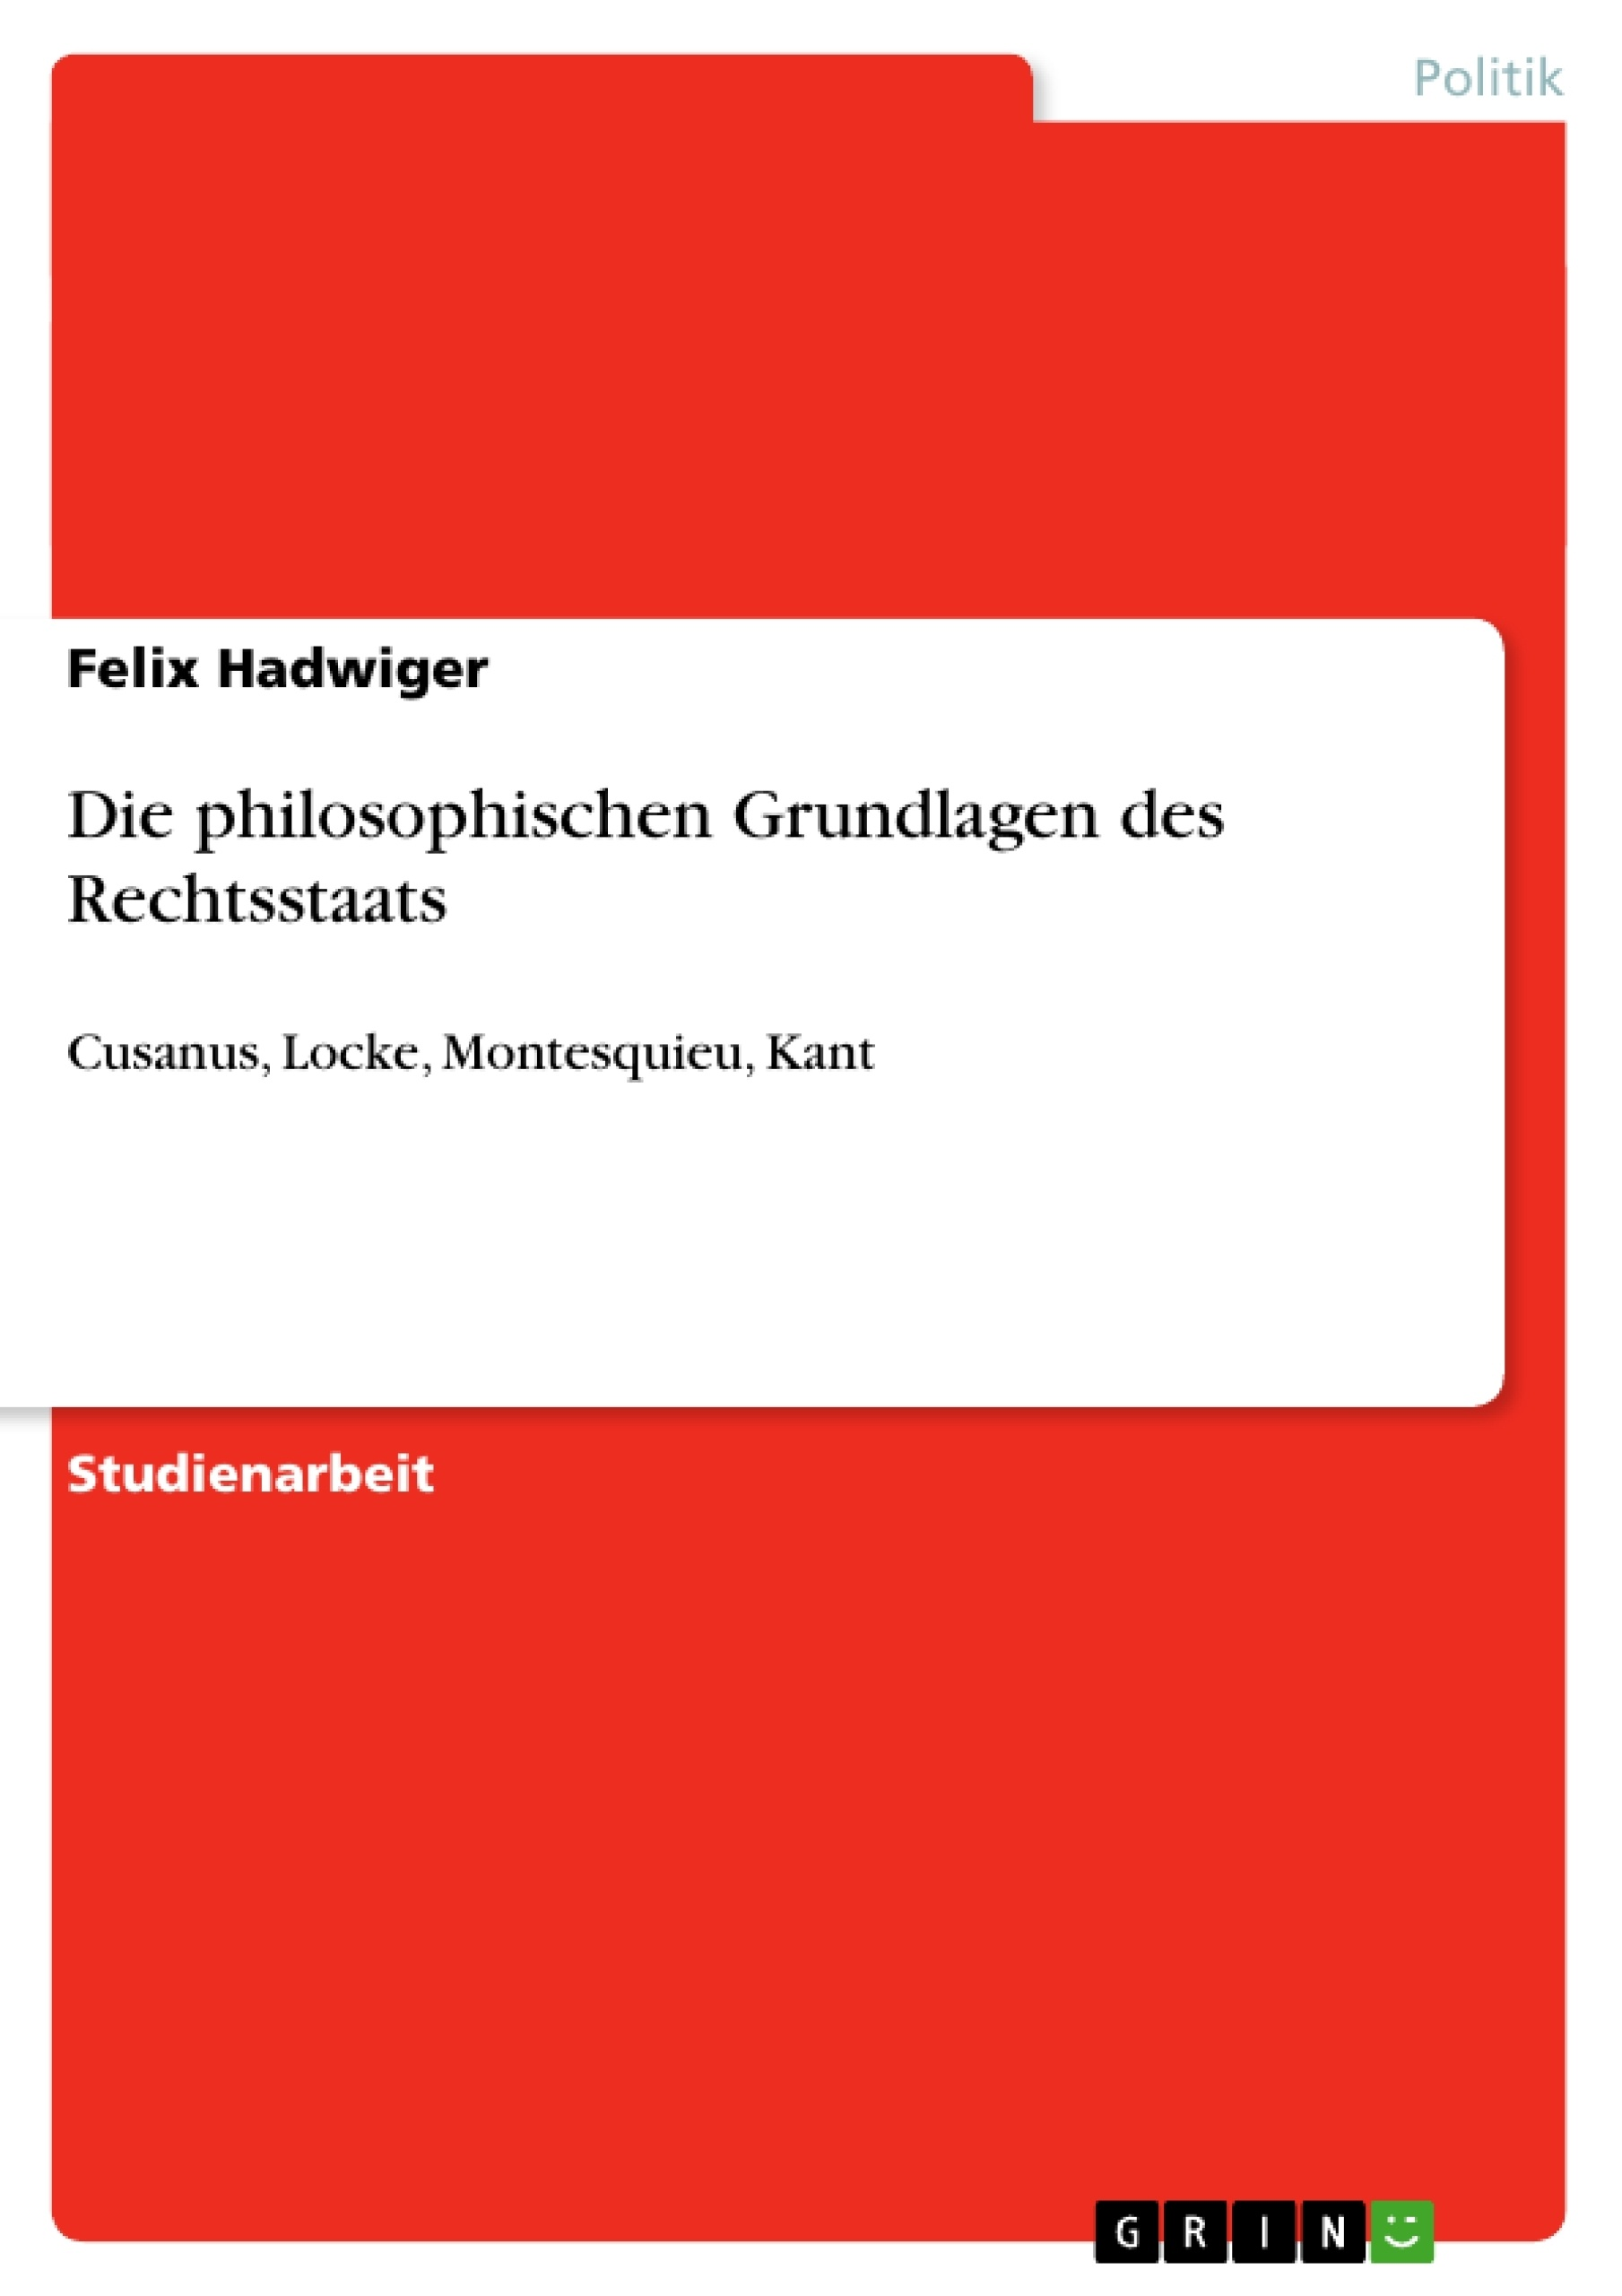 Titel: Die philosophischen Grundlagen des Rechtsstaats